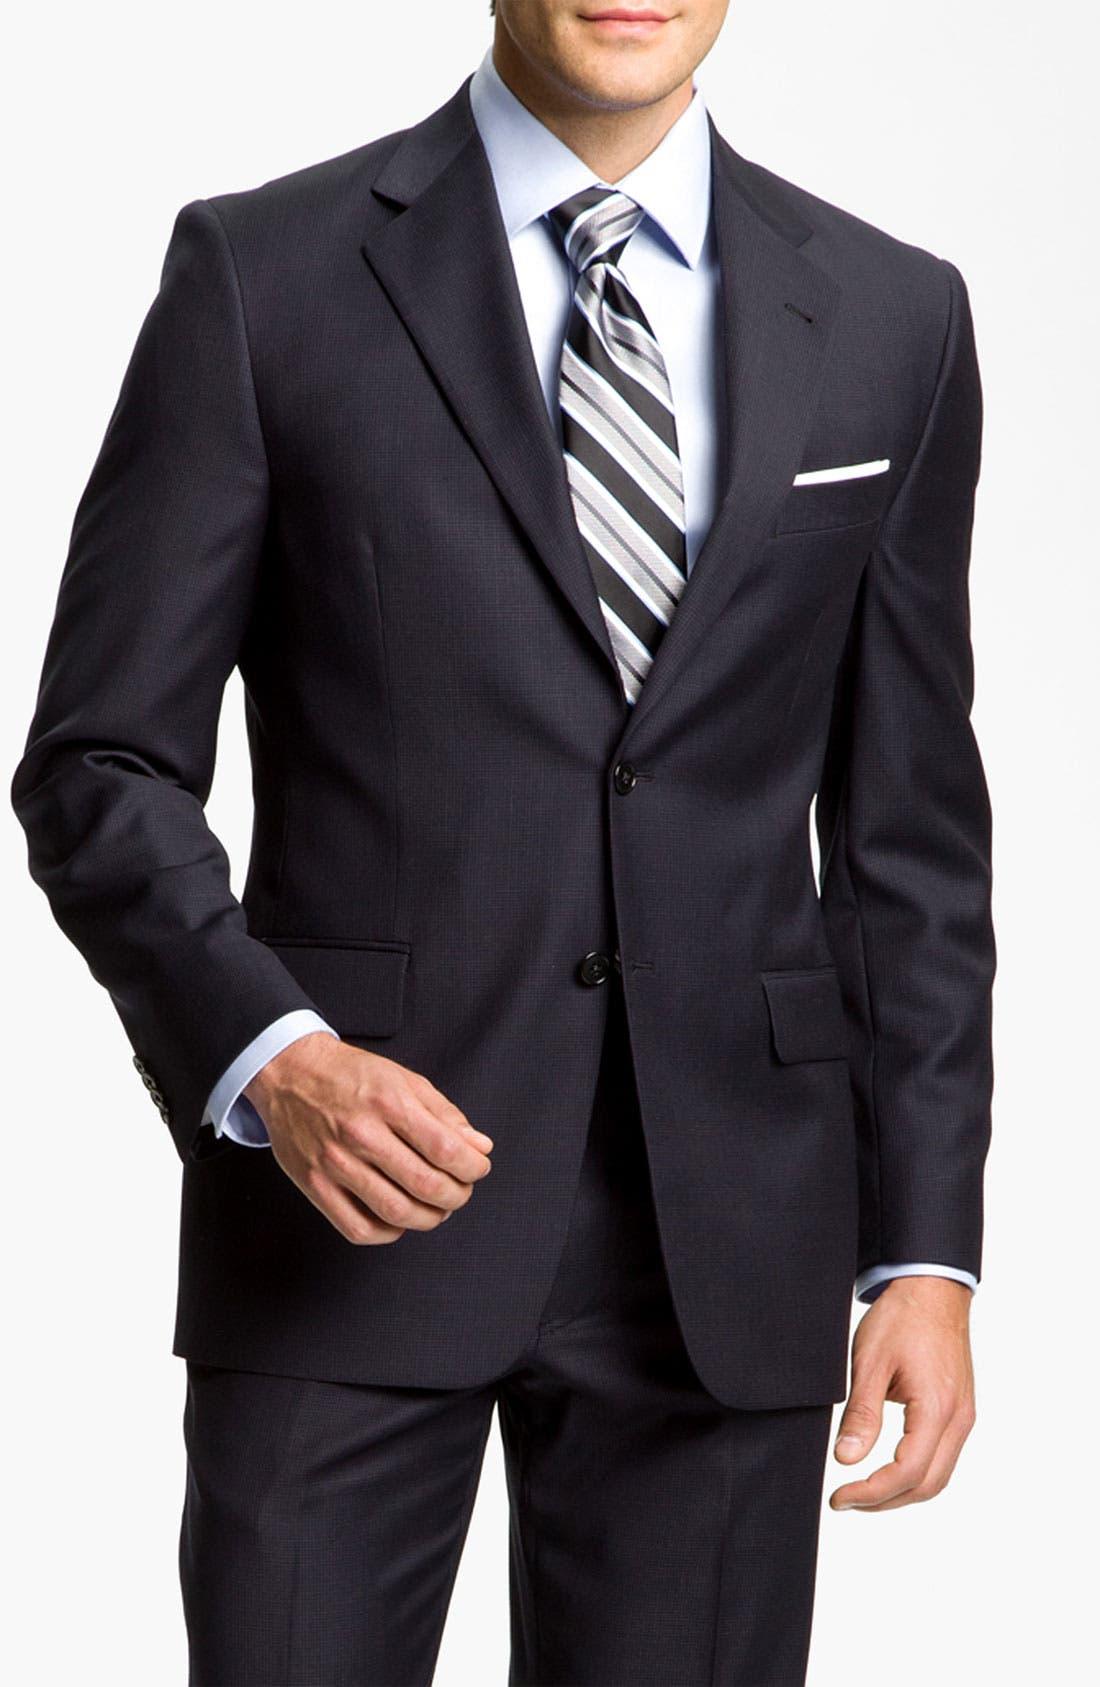 Alternate Image 1 Selected - Joseph Abboud 'Profile Hybrid Signature' Wool Suit